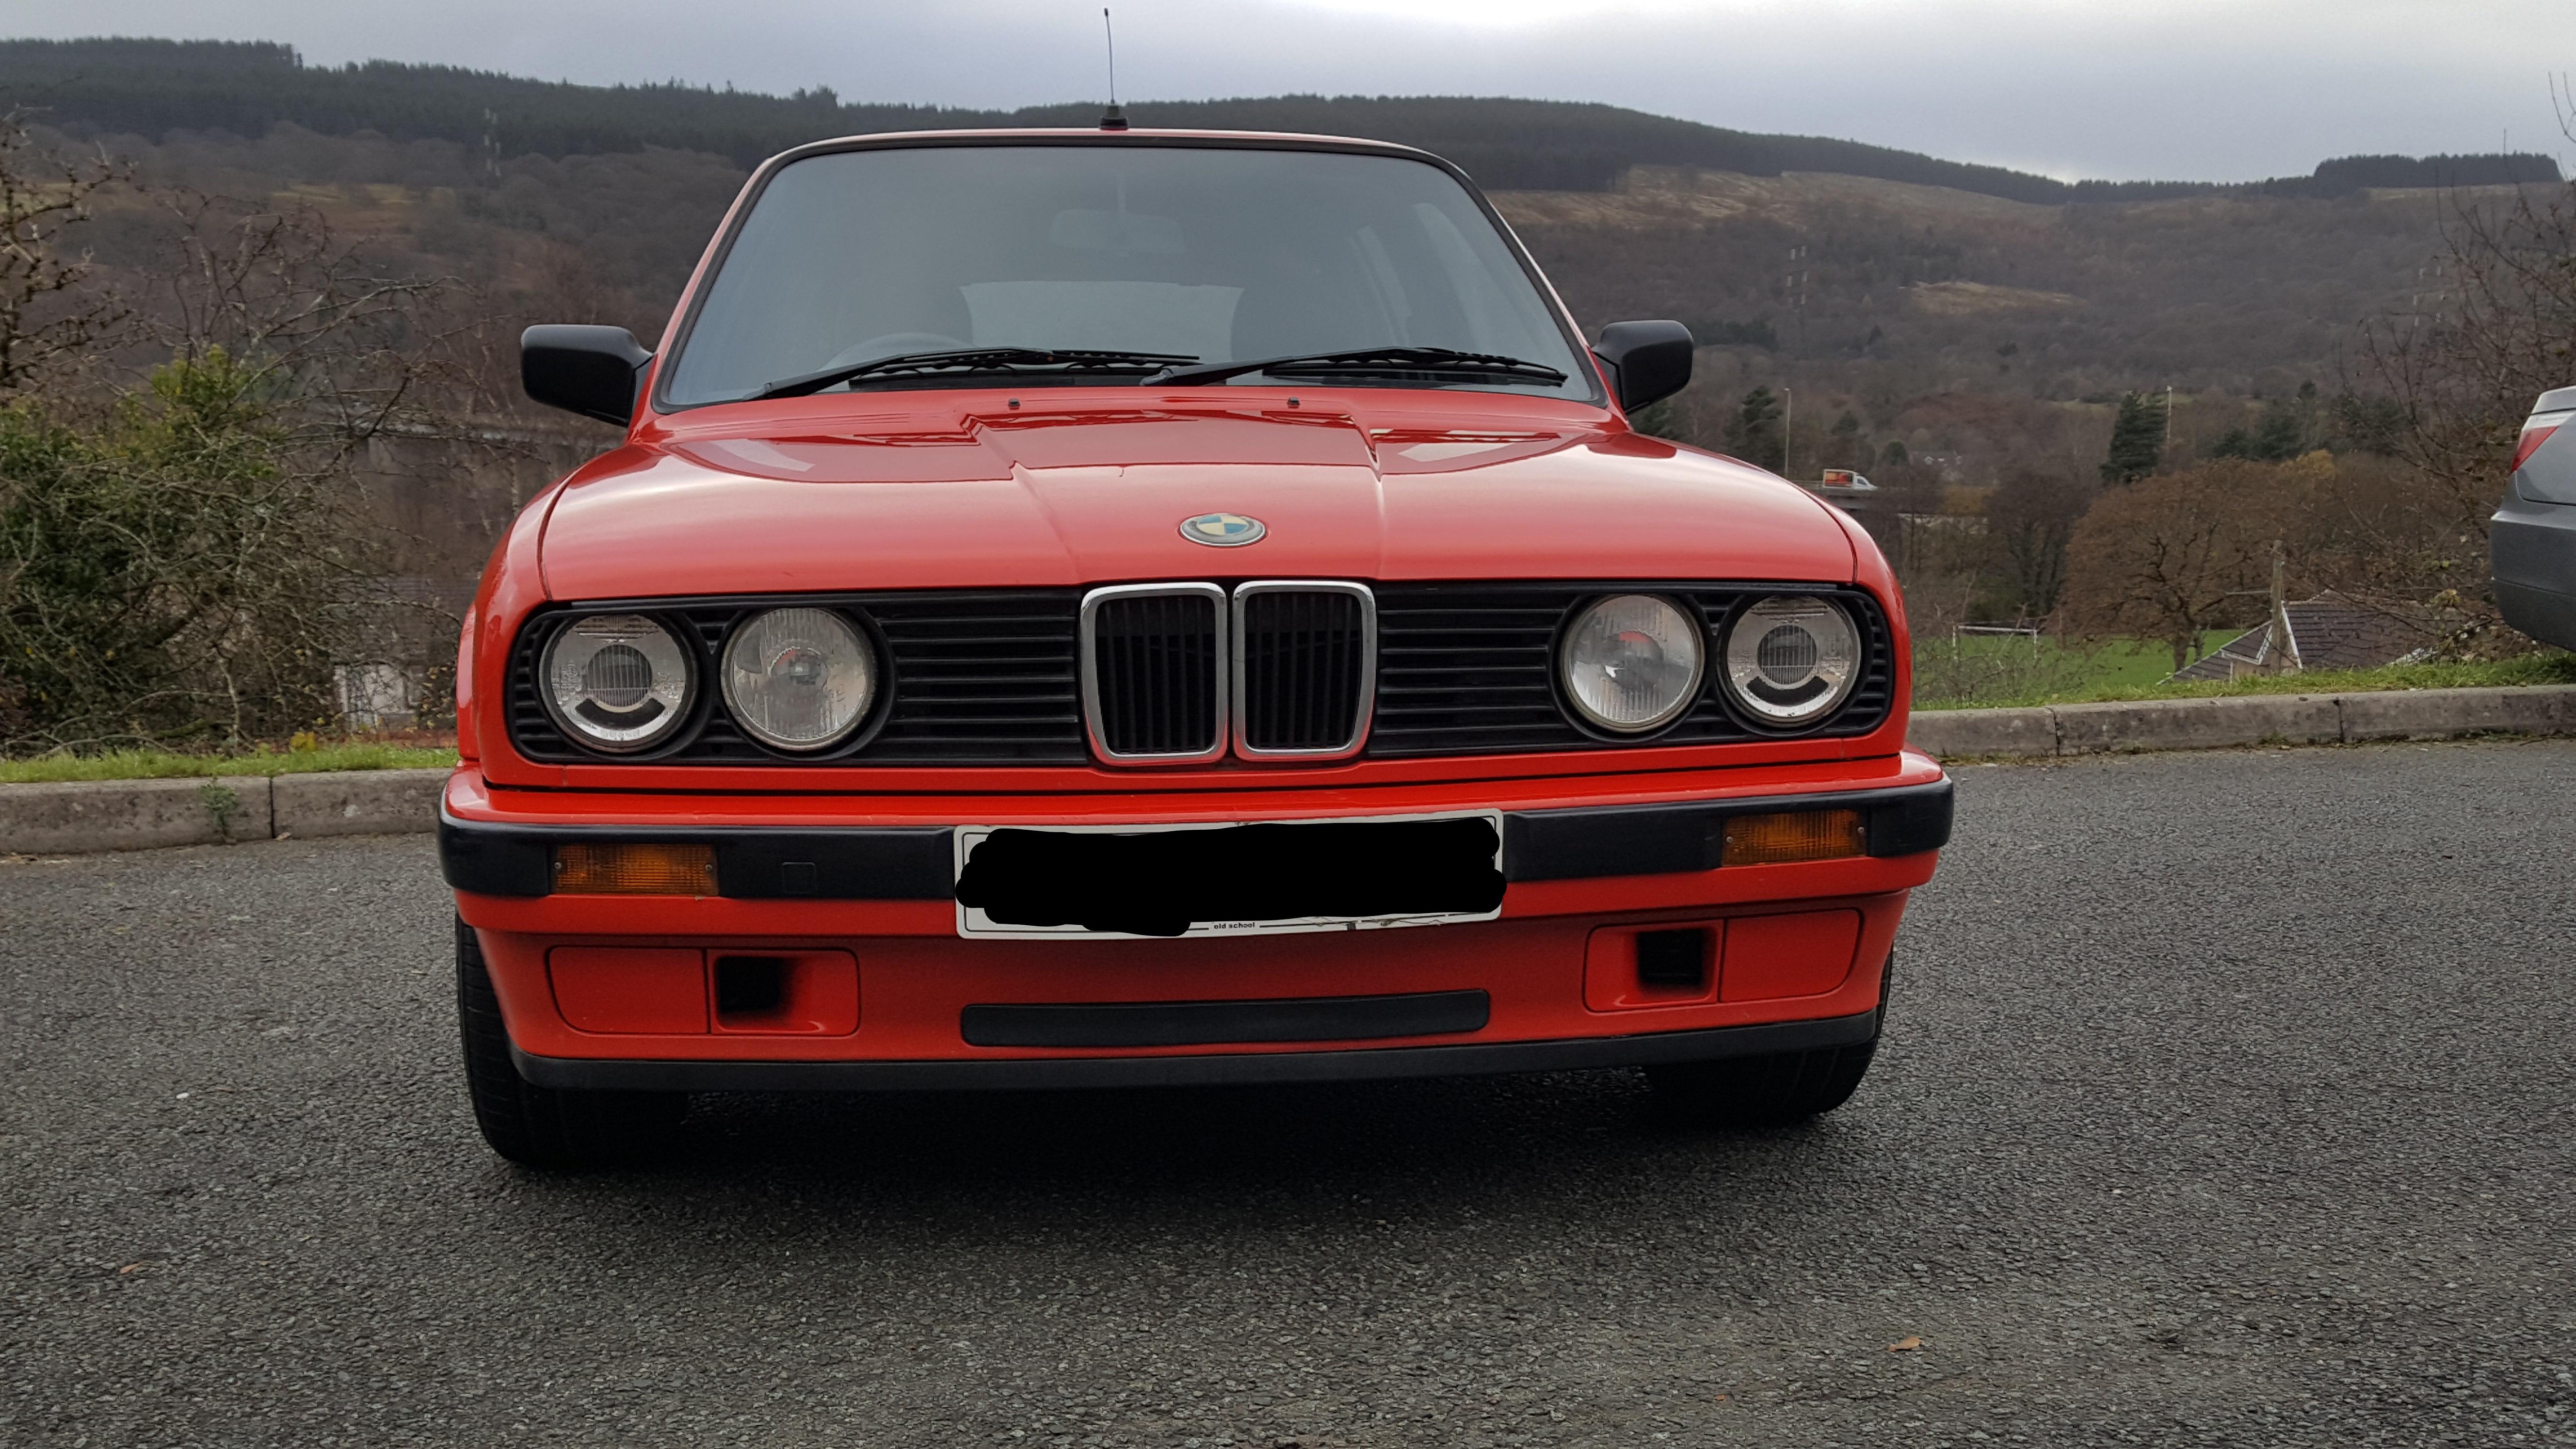 1994 bmw e30 318i lux for Garage bmw chambery 73